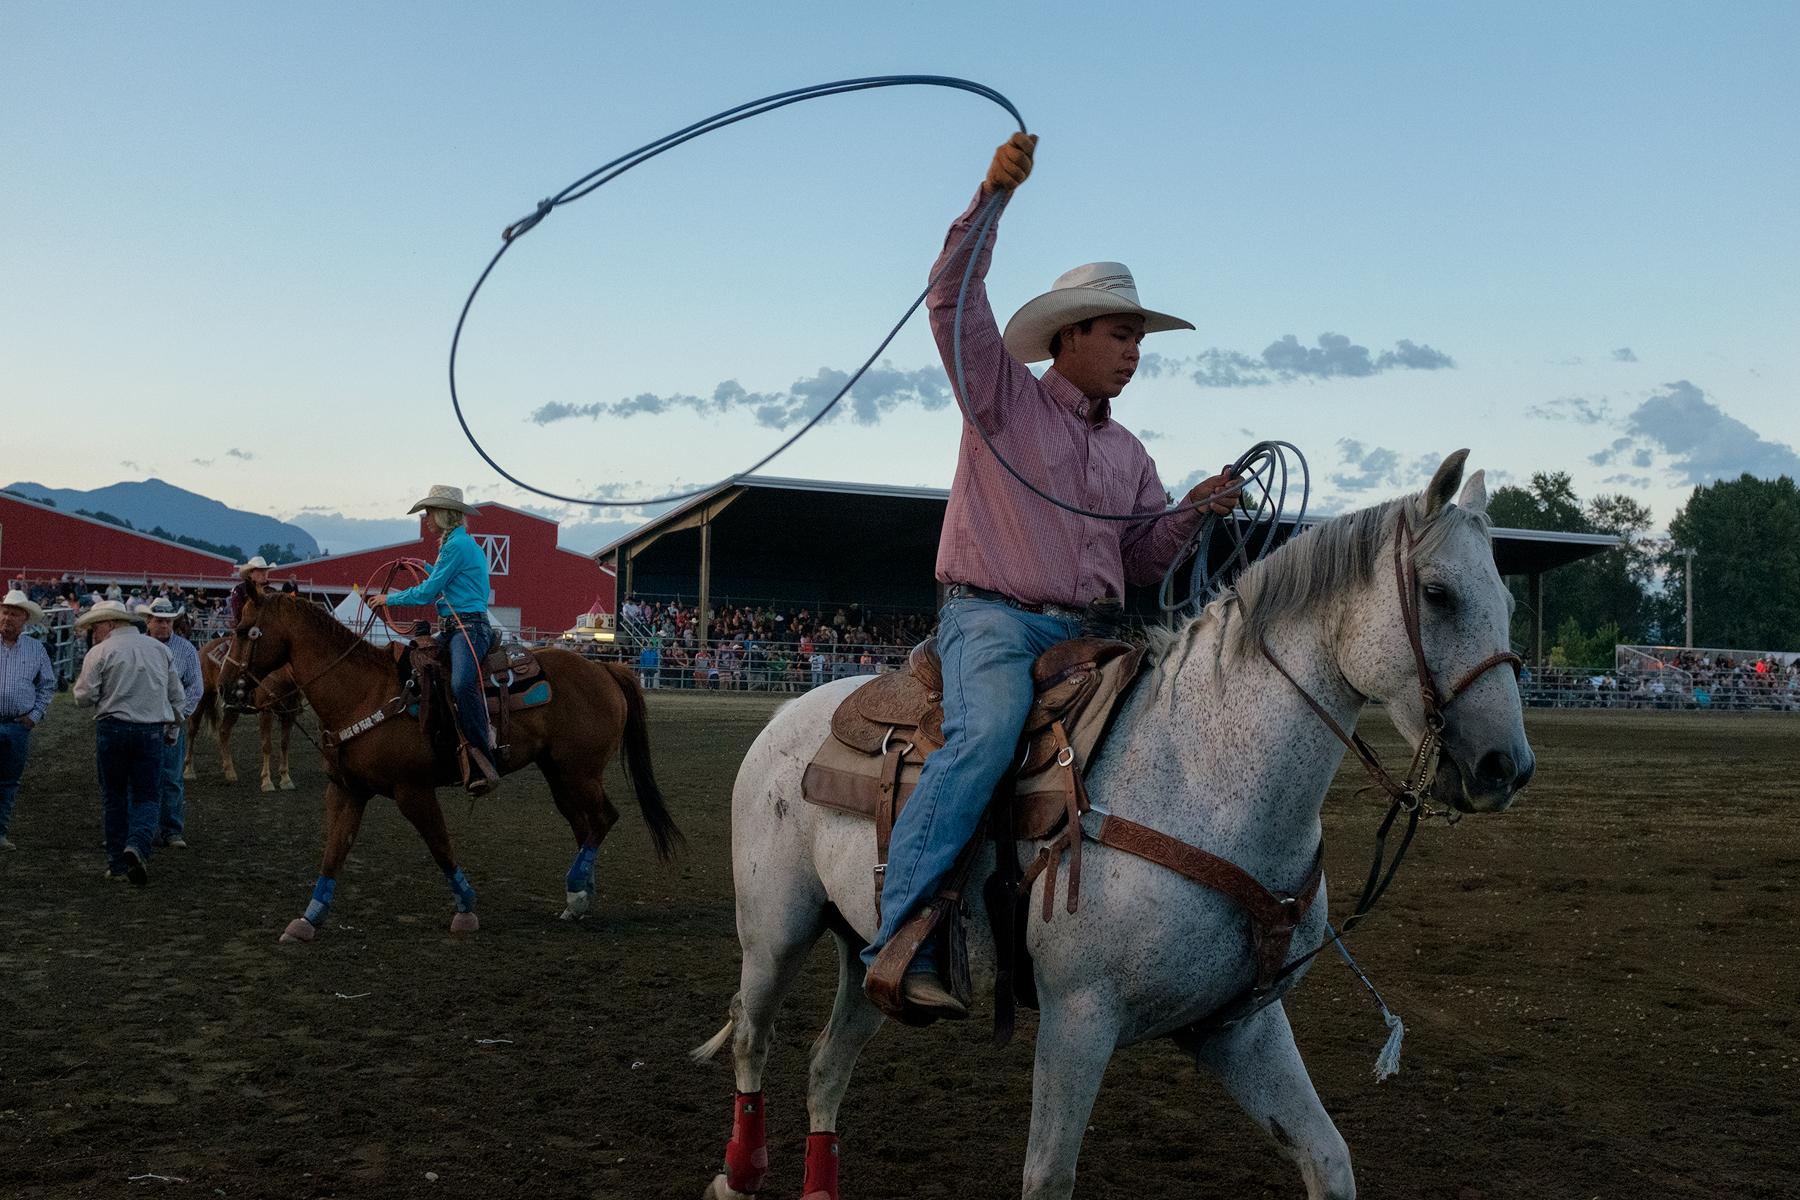 Chilliwack Rodeo  Chiliwack, British Columbia, Canada  Image ©Connor Stefanison